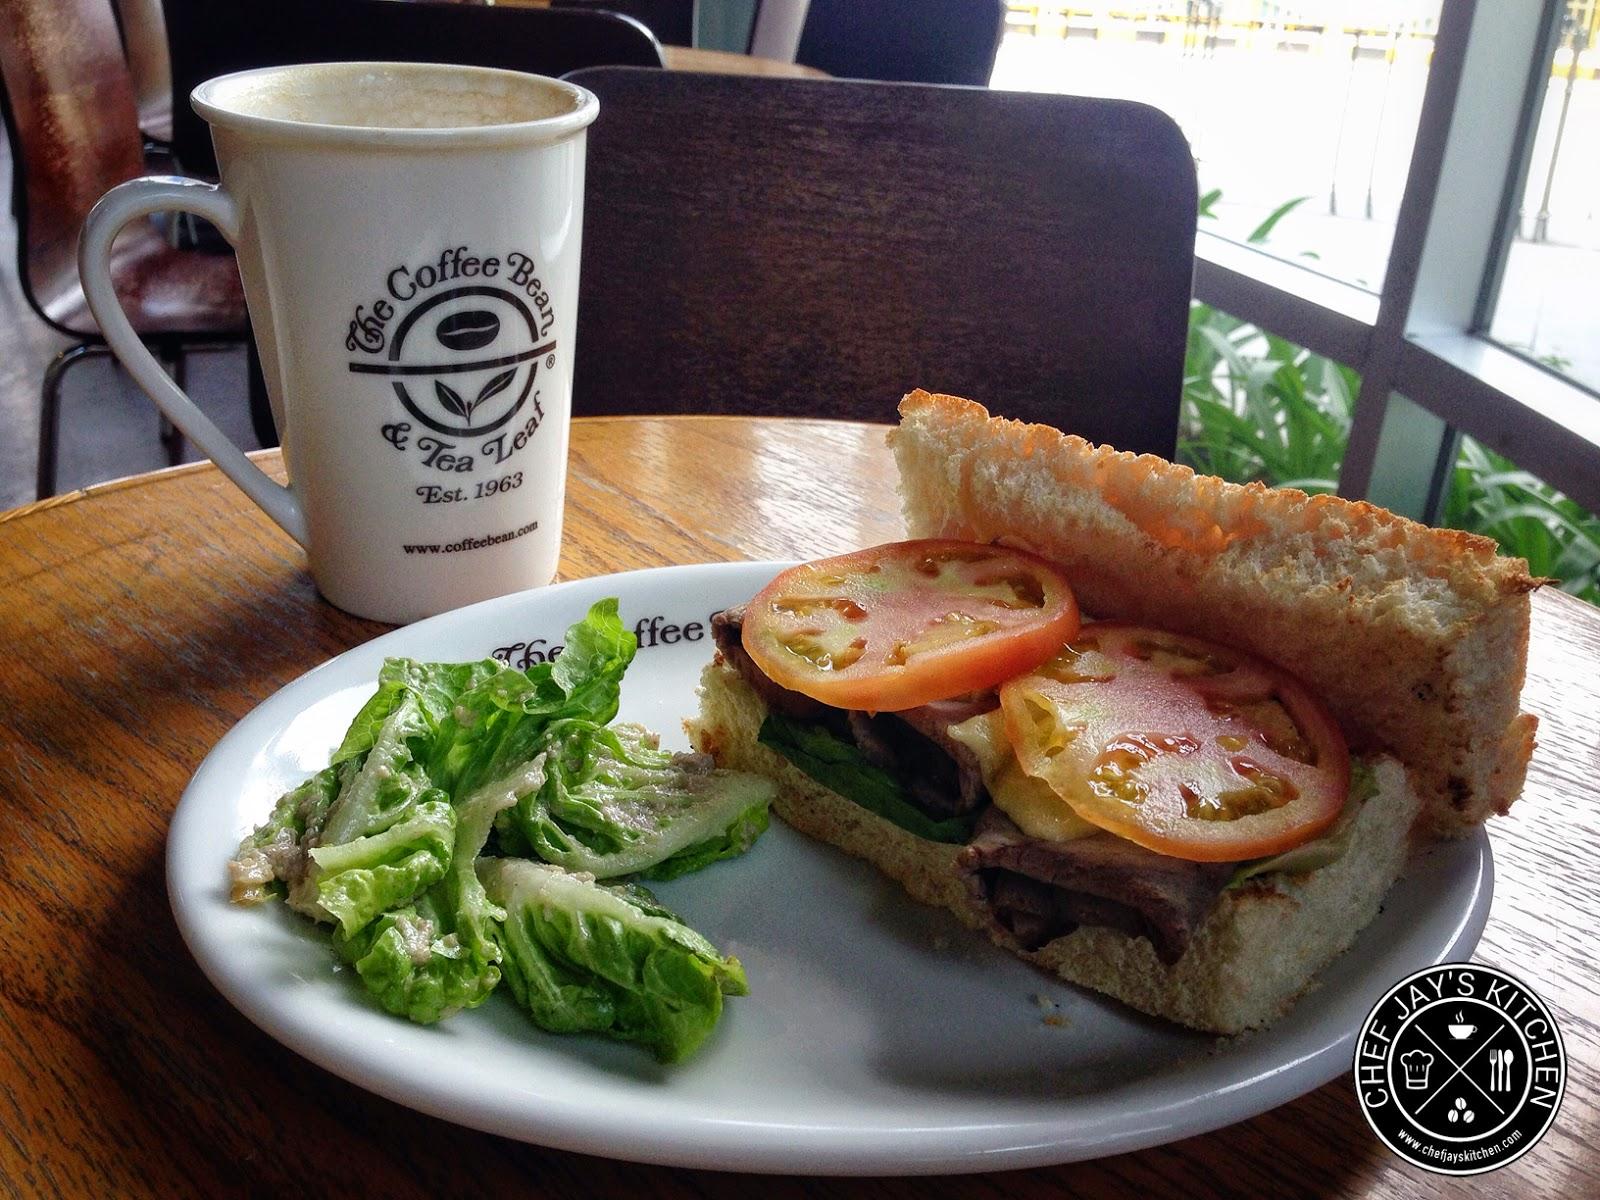 The Coffee Bean & Tea Leaf - CBTL Roast Beef Sandwich